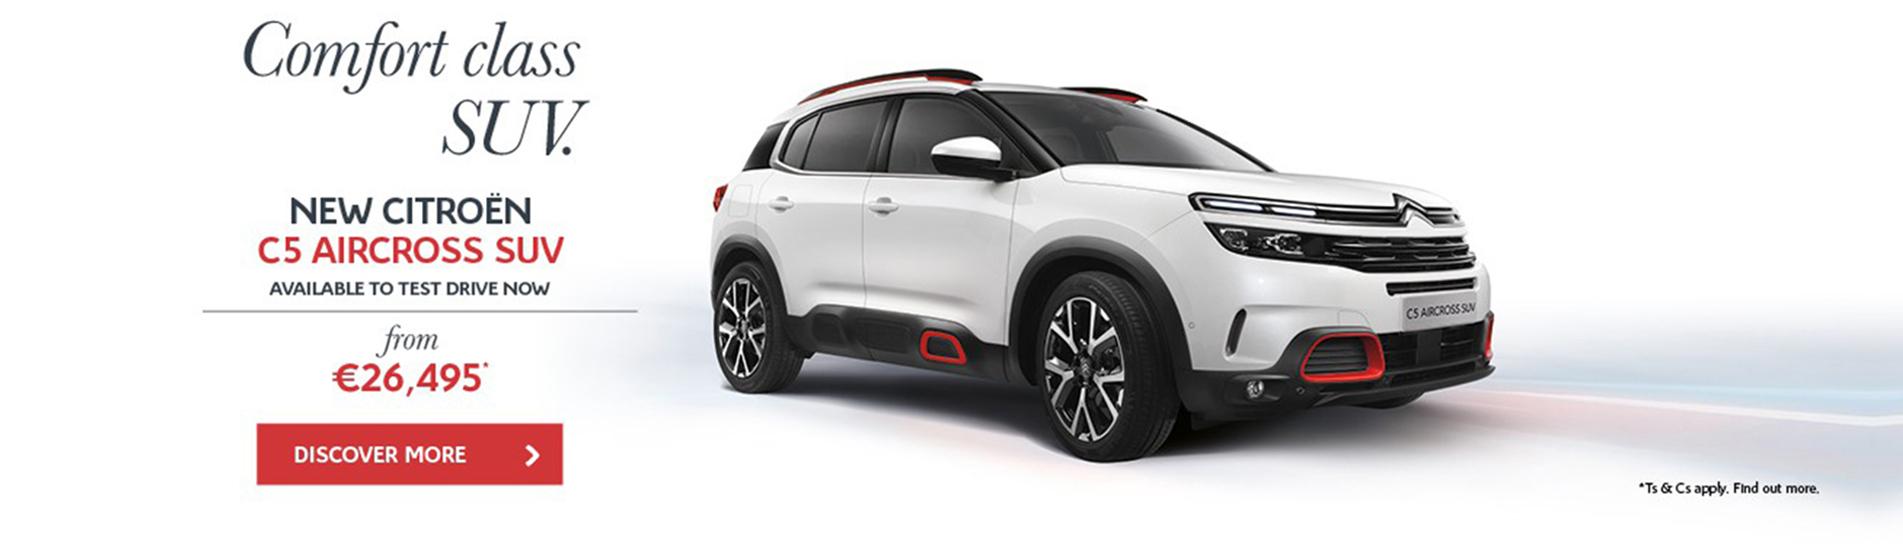 Used Cars For Sale, New Citroen, Subaru Cork